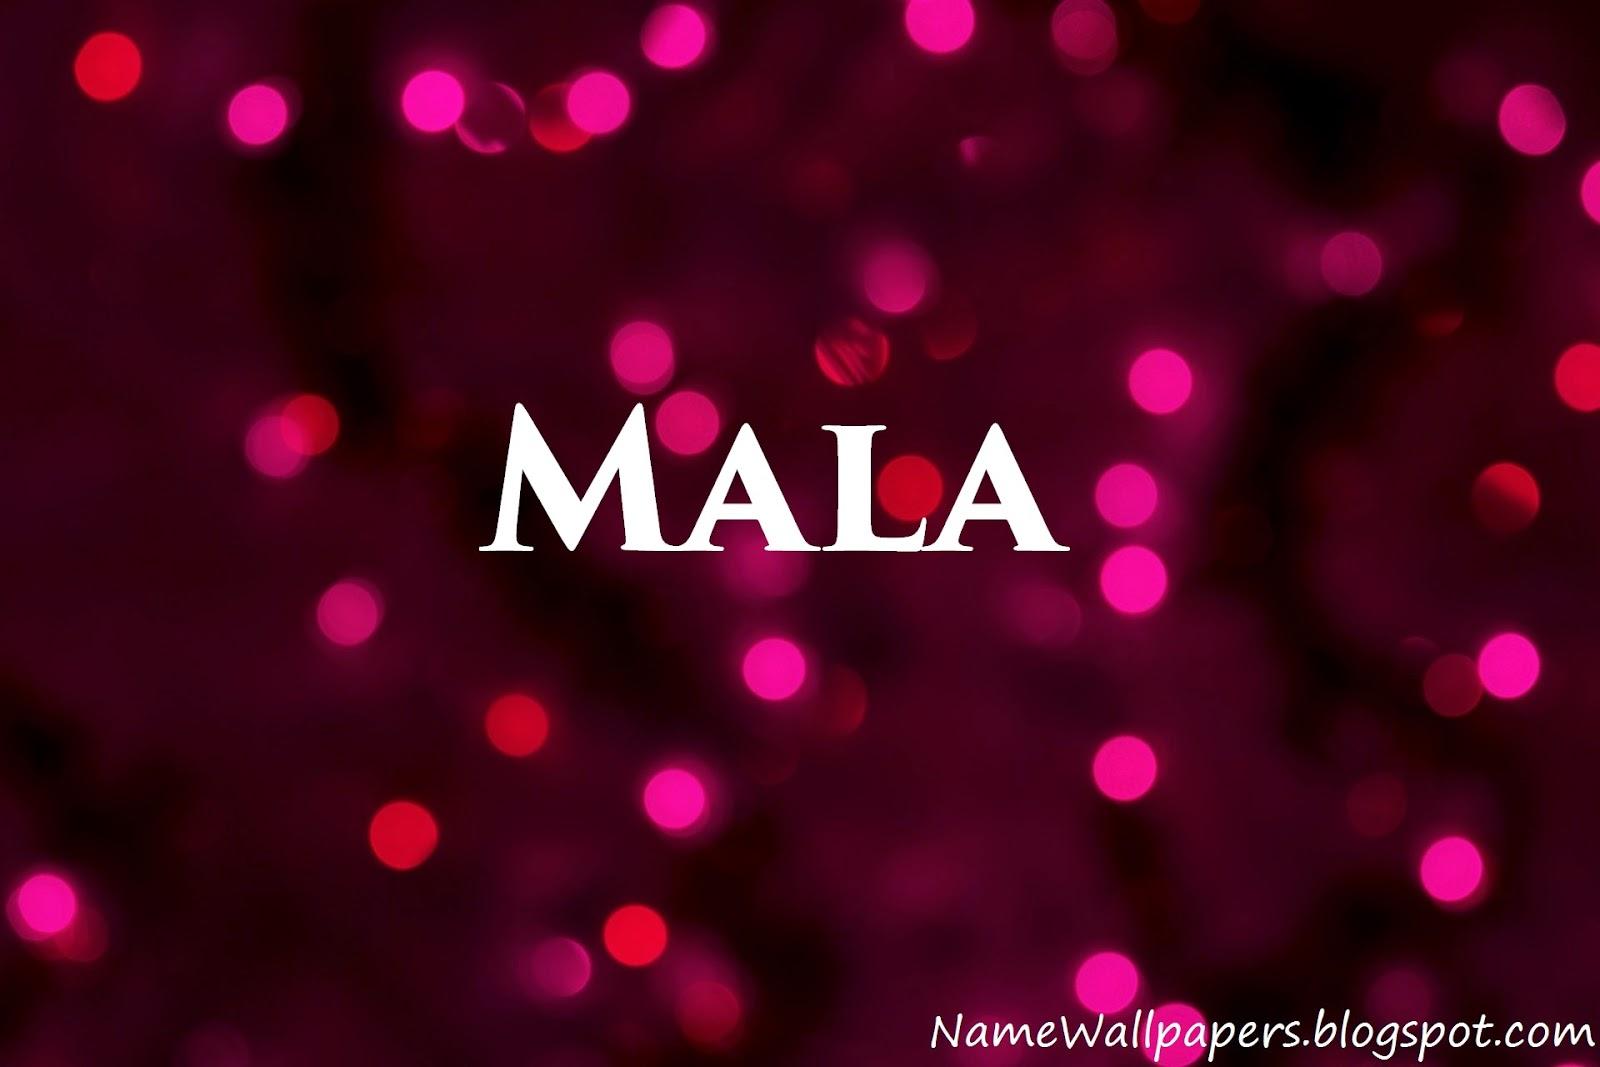 Kaaba Wallpaper Hd Download Mala Name Wallpaper Gallery